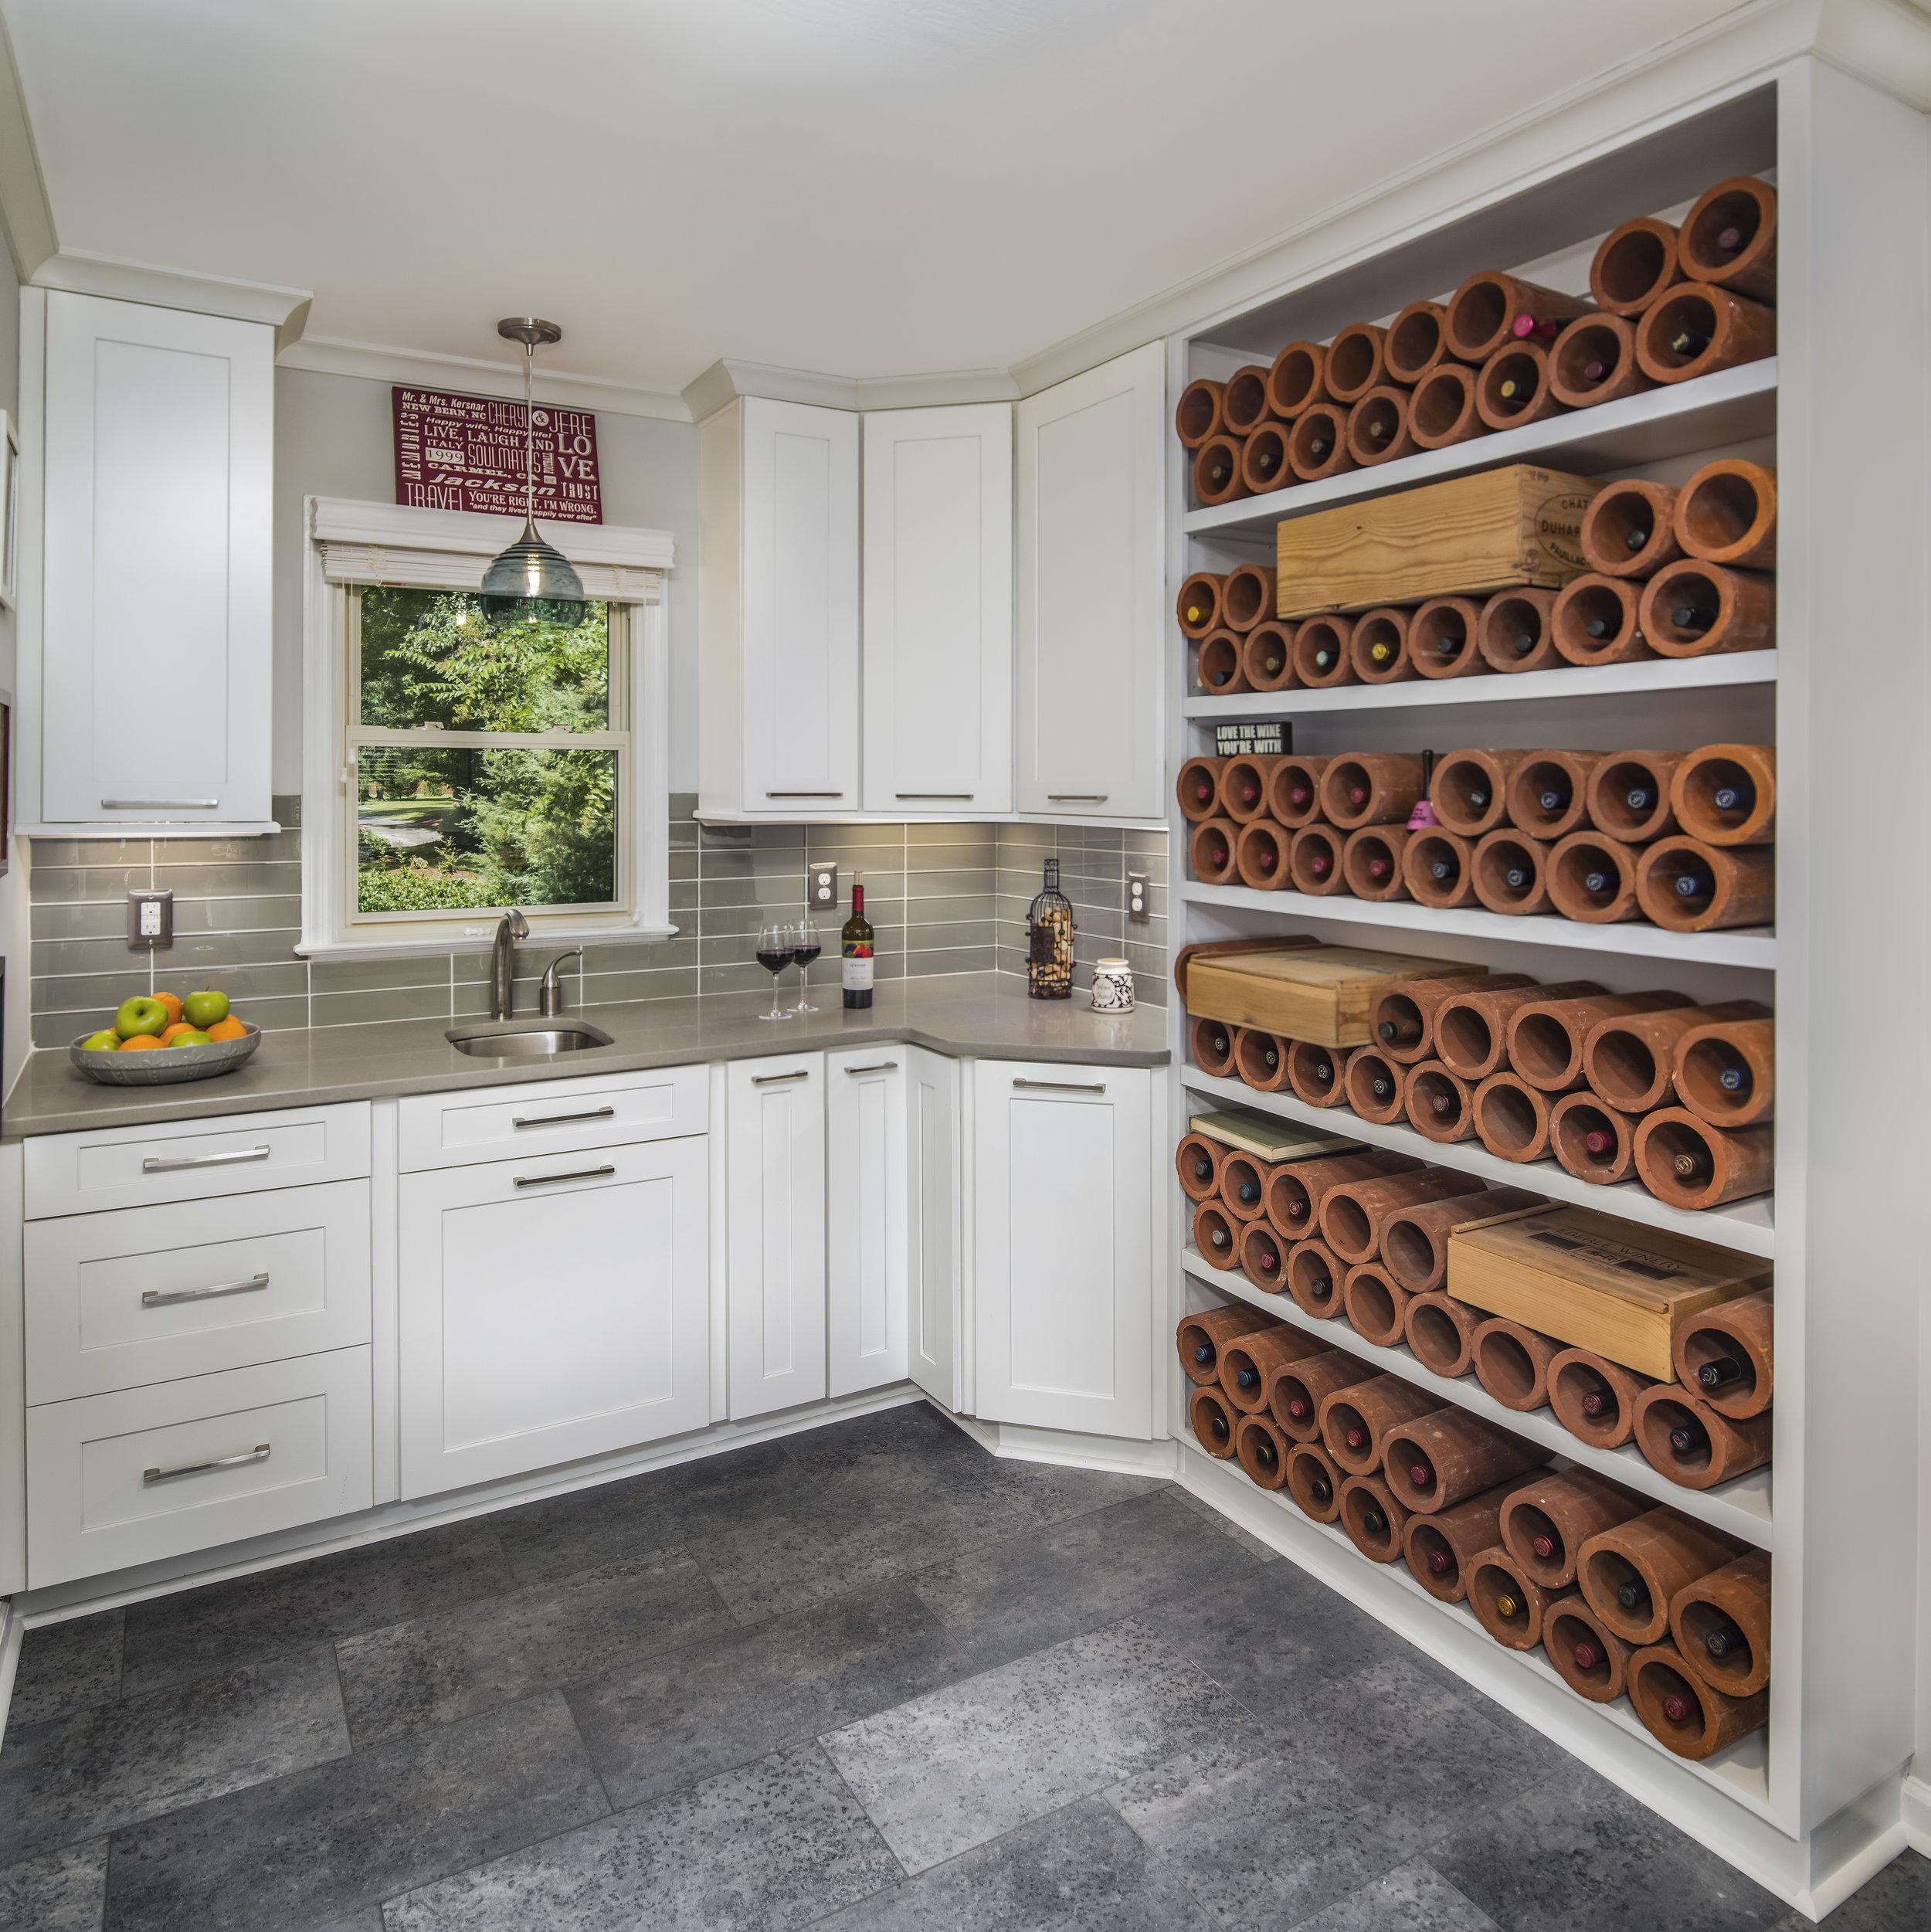 kitchen remodel with cork wine rack